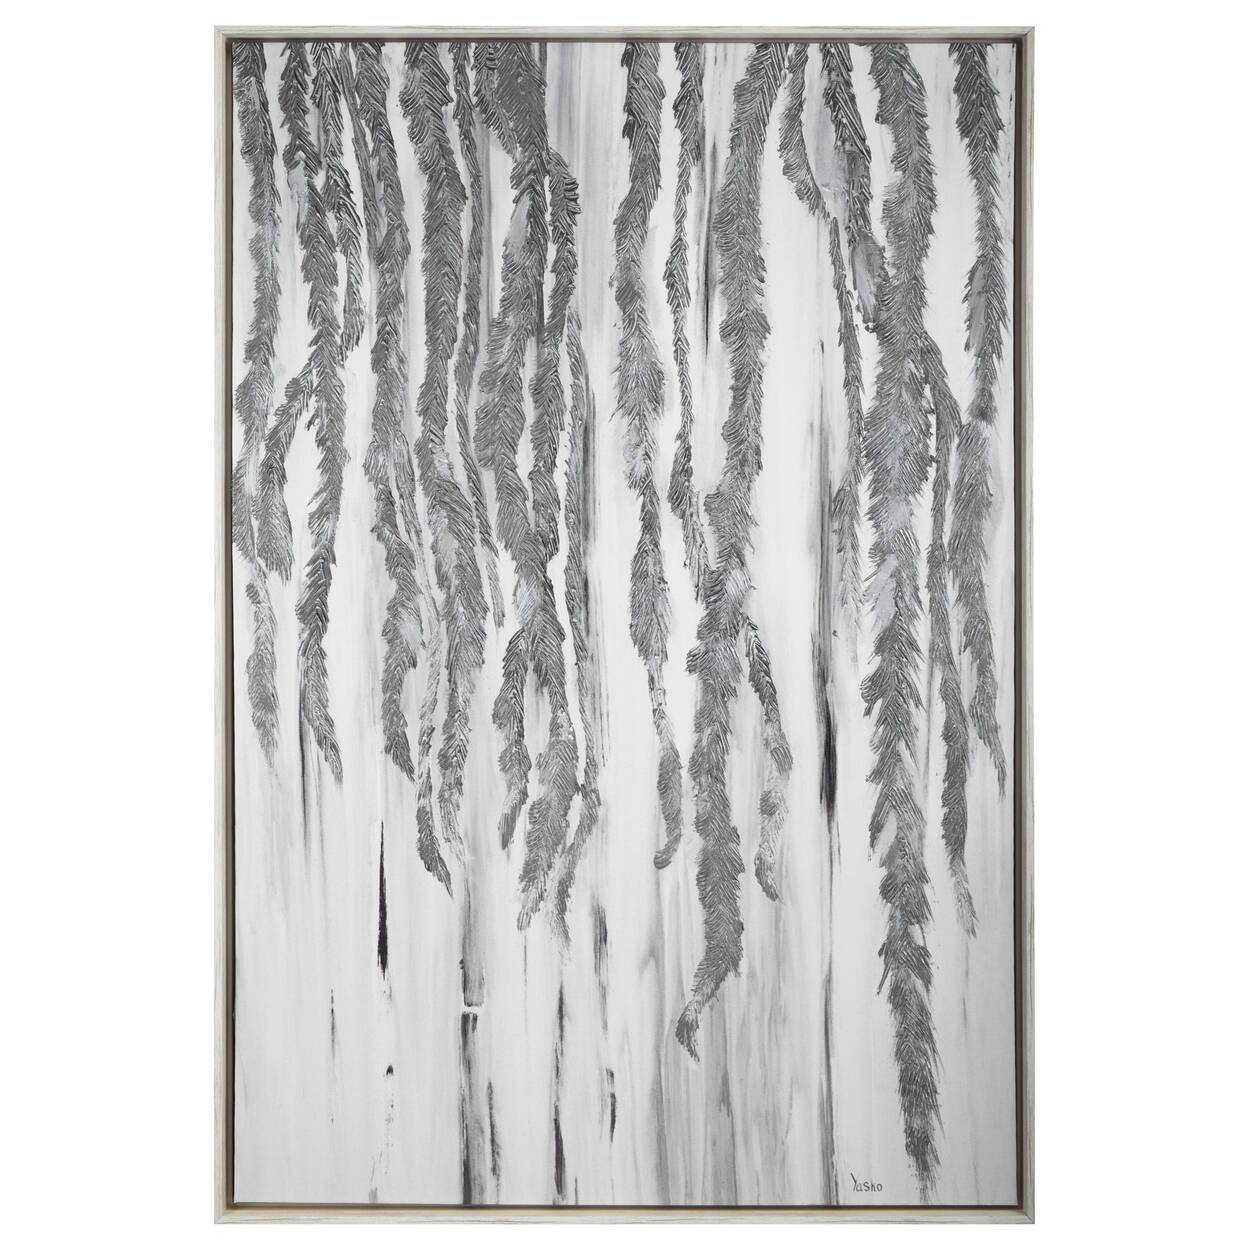 Oversized Printed & Painted Silver Leaf Framed Art | Bouclair.com